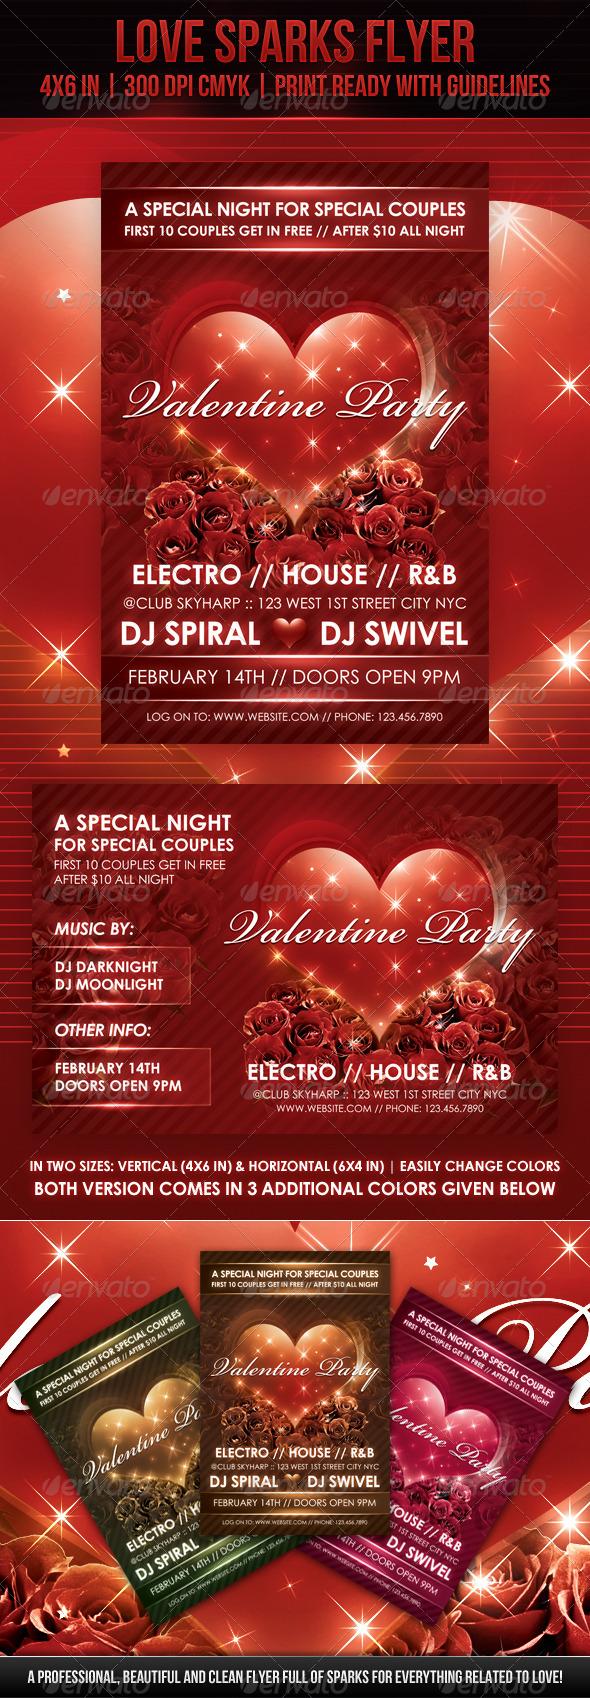 GraphicRiver Love Sparks Valentine Flyer 1369269